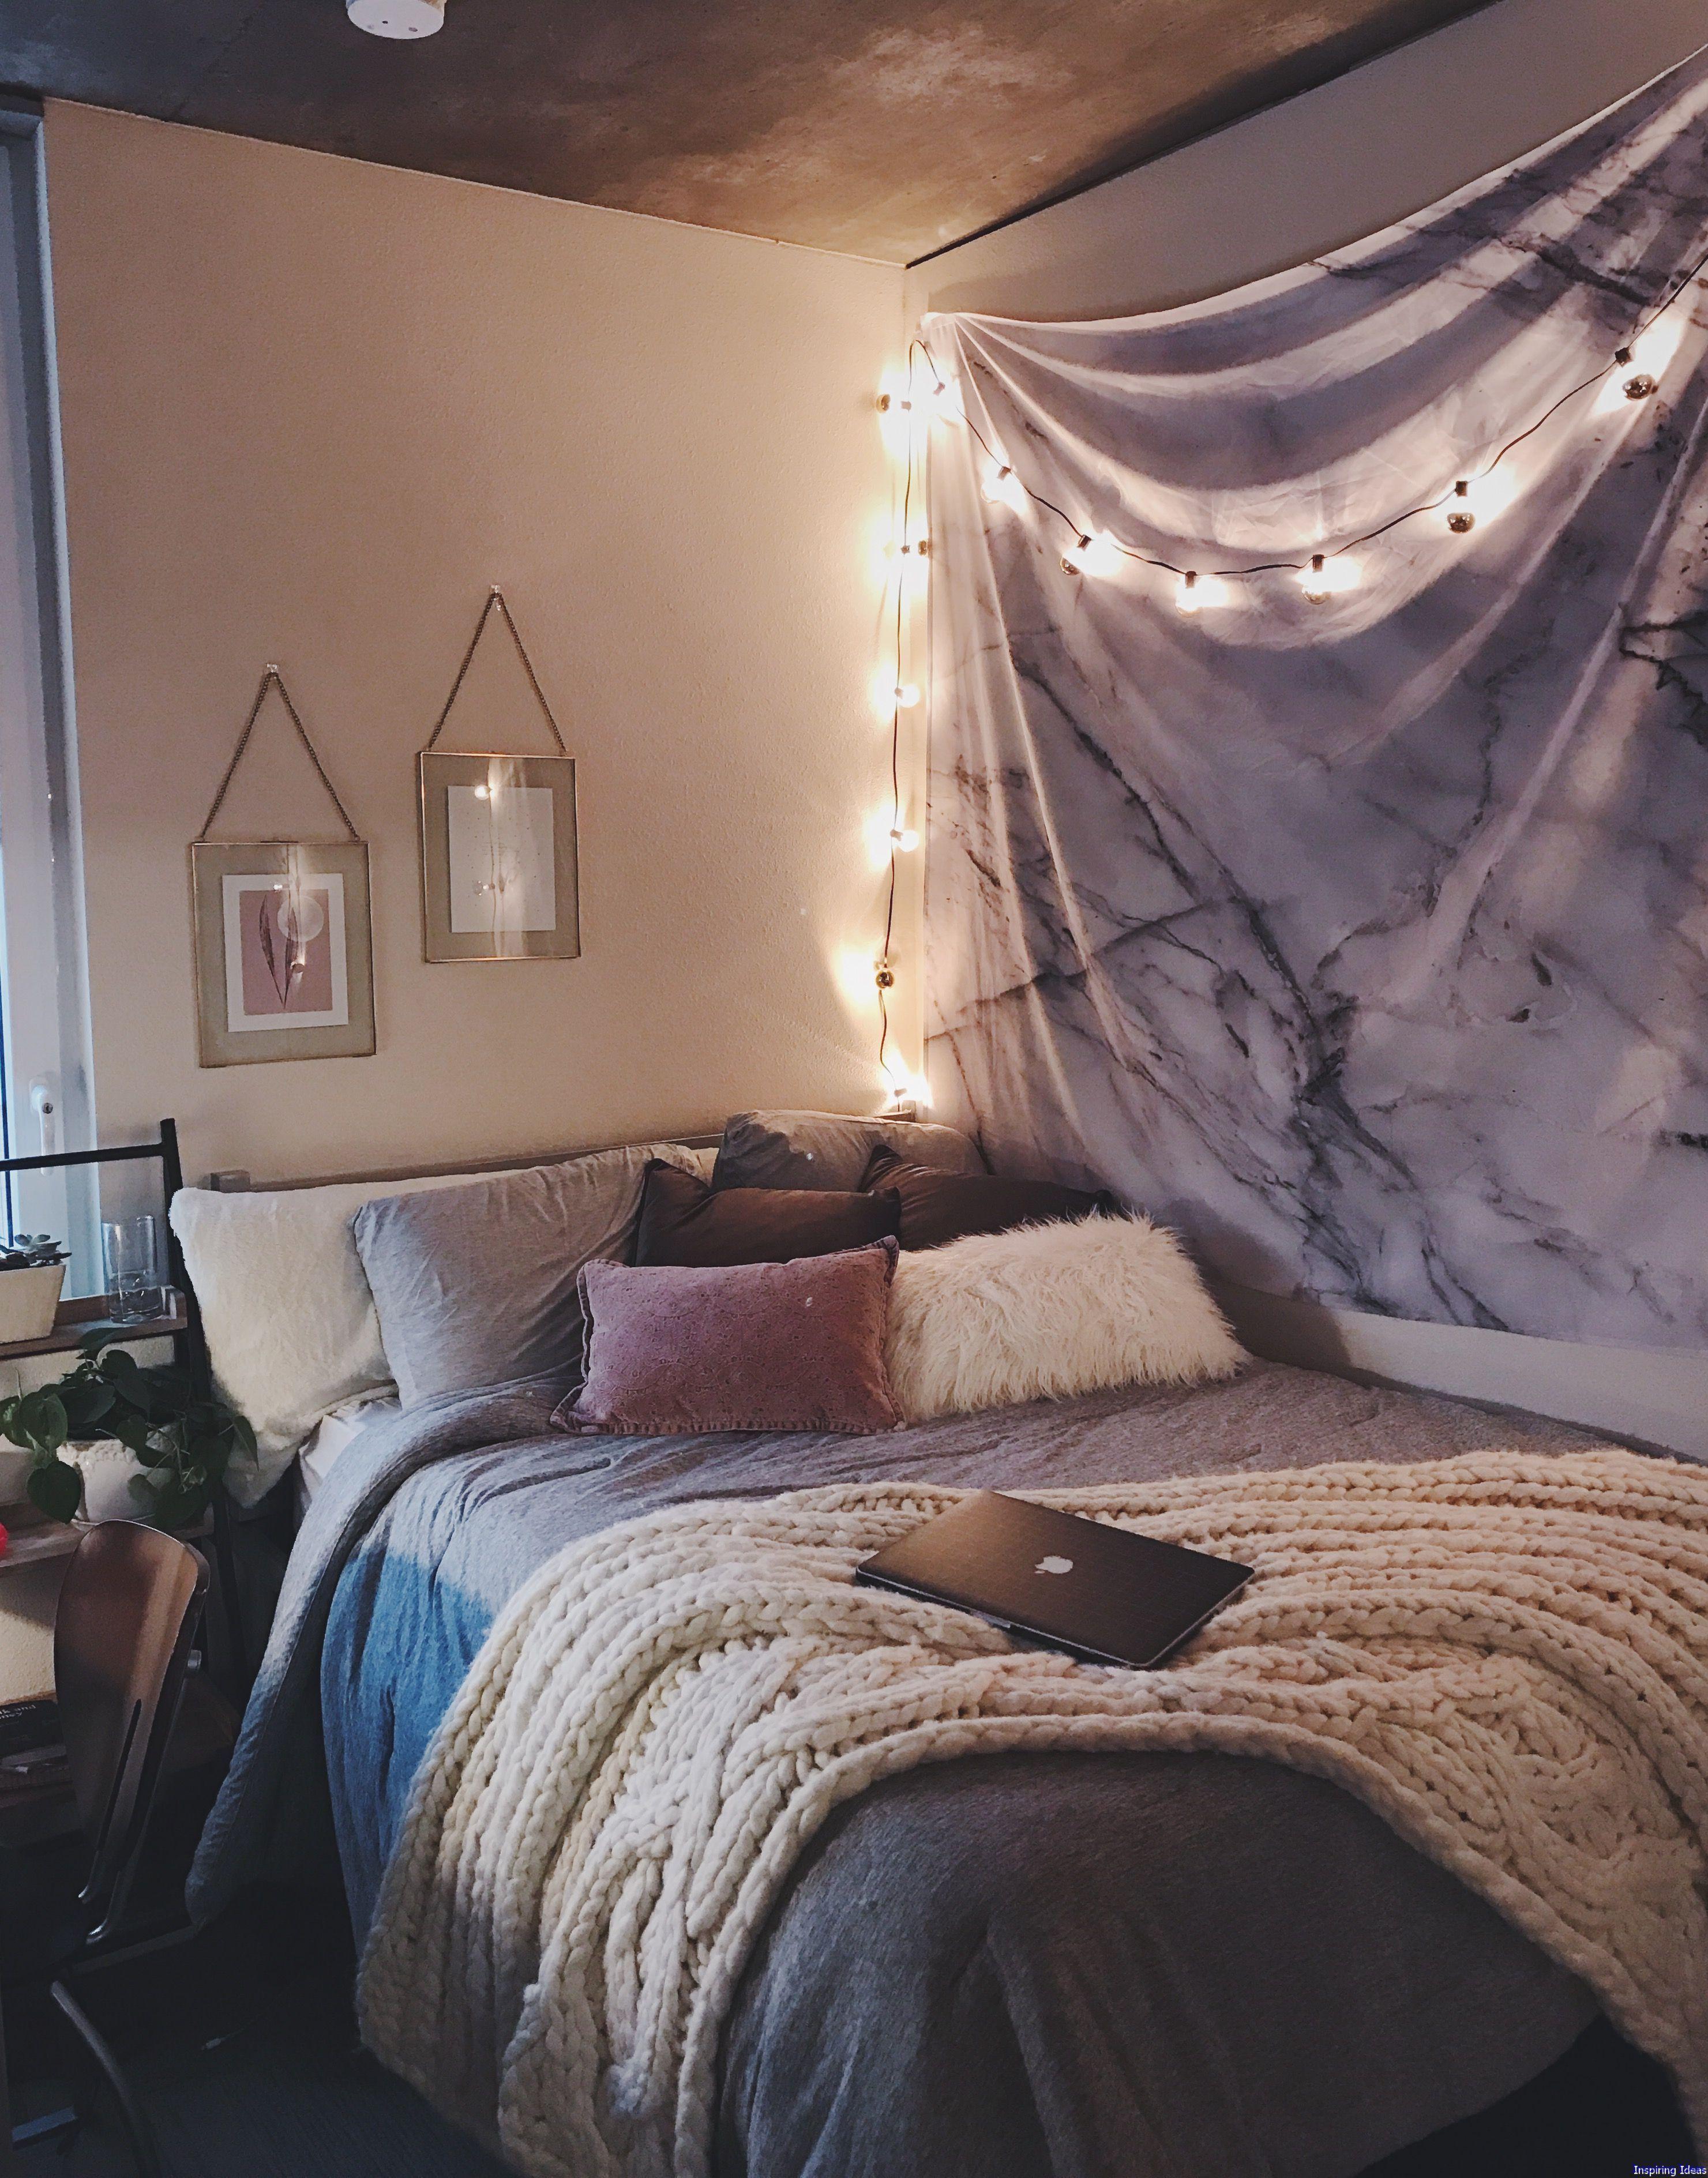 85 super cozy bedroom ideas to inspire you minimalist on cozy minimalist bedroom decorating ideas id=45665